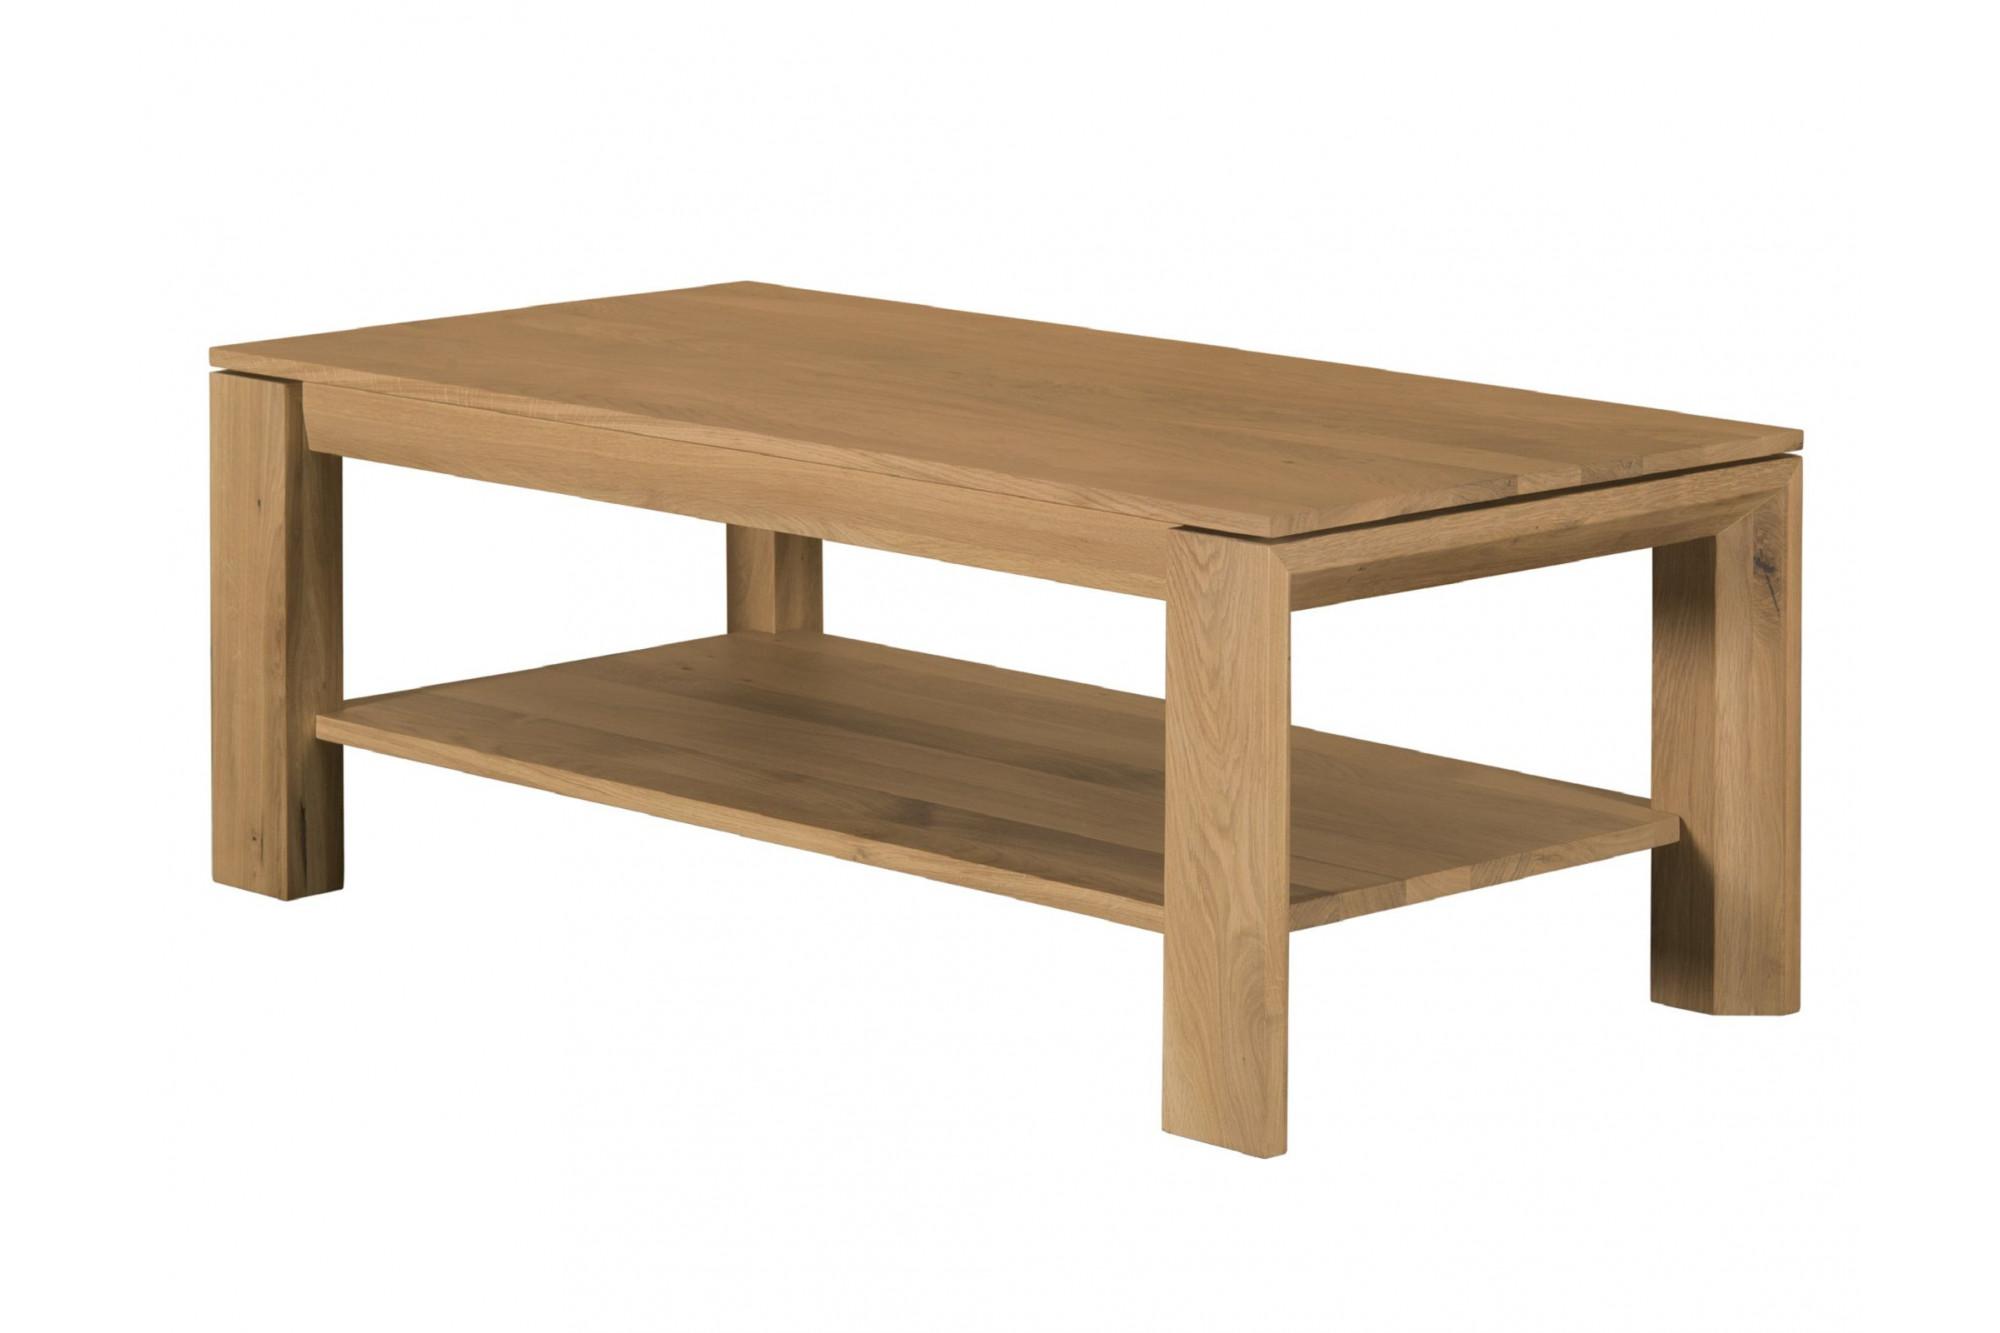 Table Basse En Chene Massif Gamme Filigrame Hellin